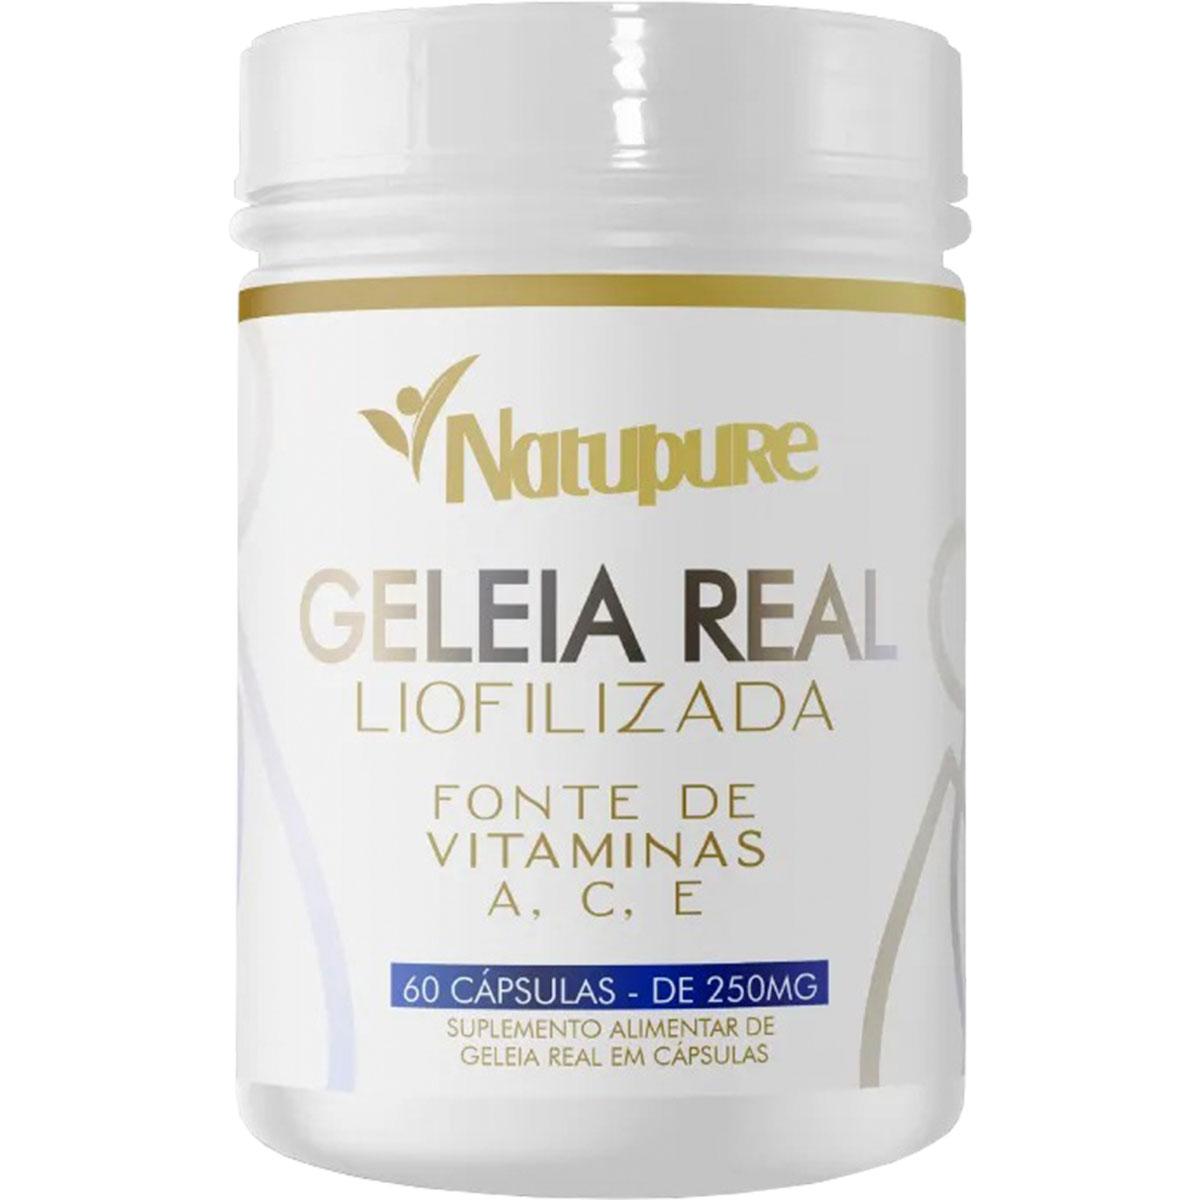 Geléia Real Liofilizada 60 Cápsulas - Natupure